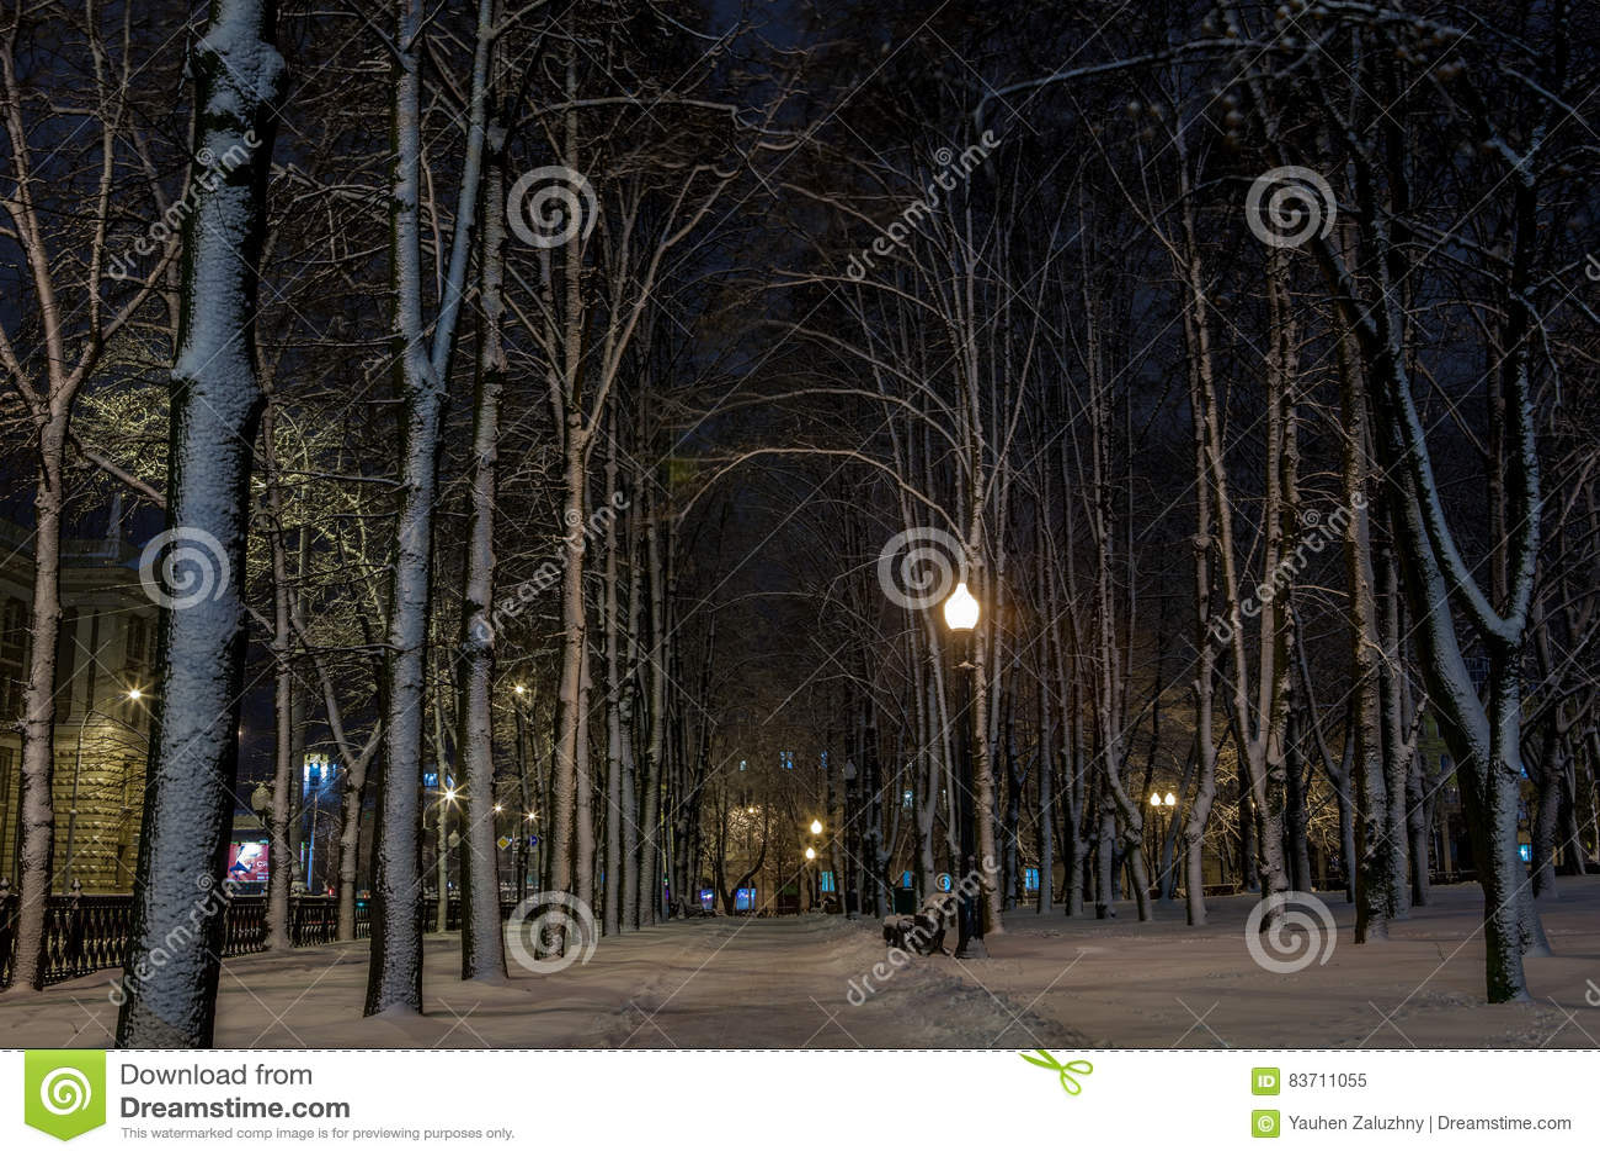 Winter In The Night City Stock Photo